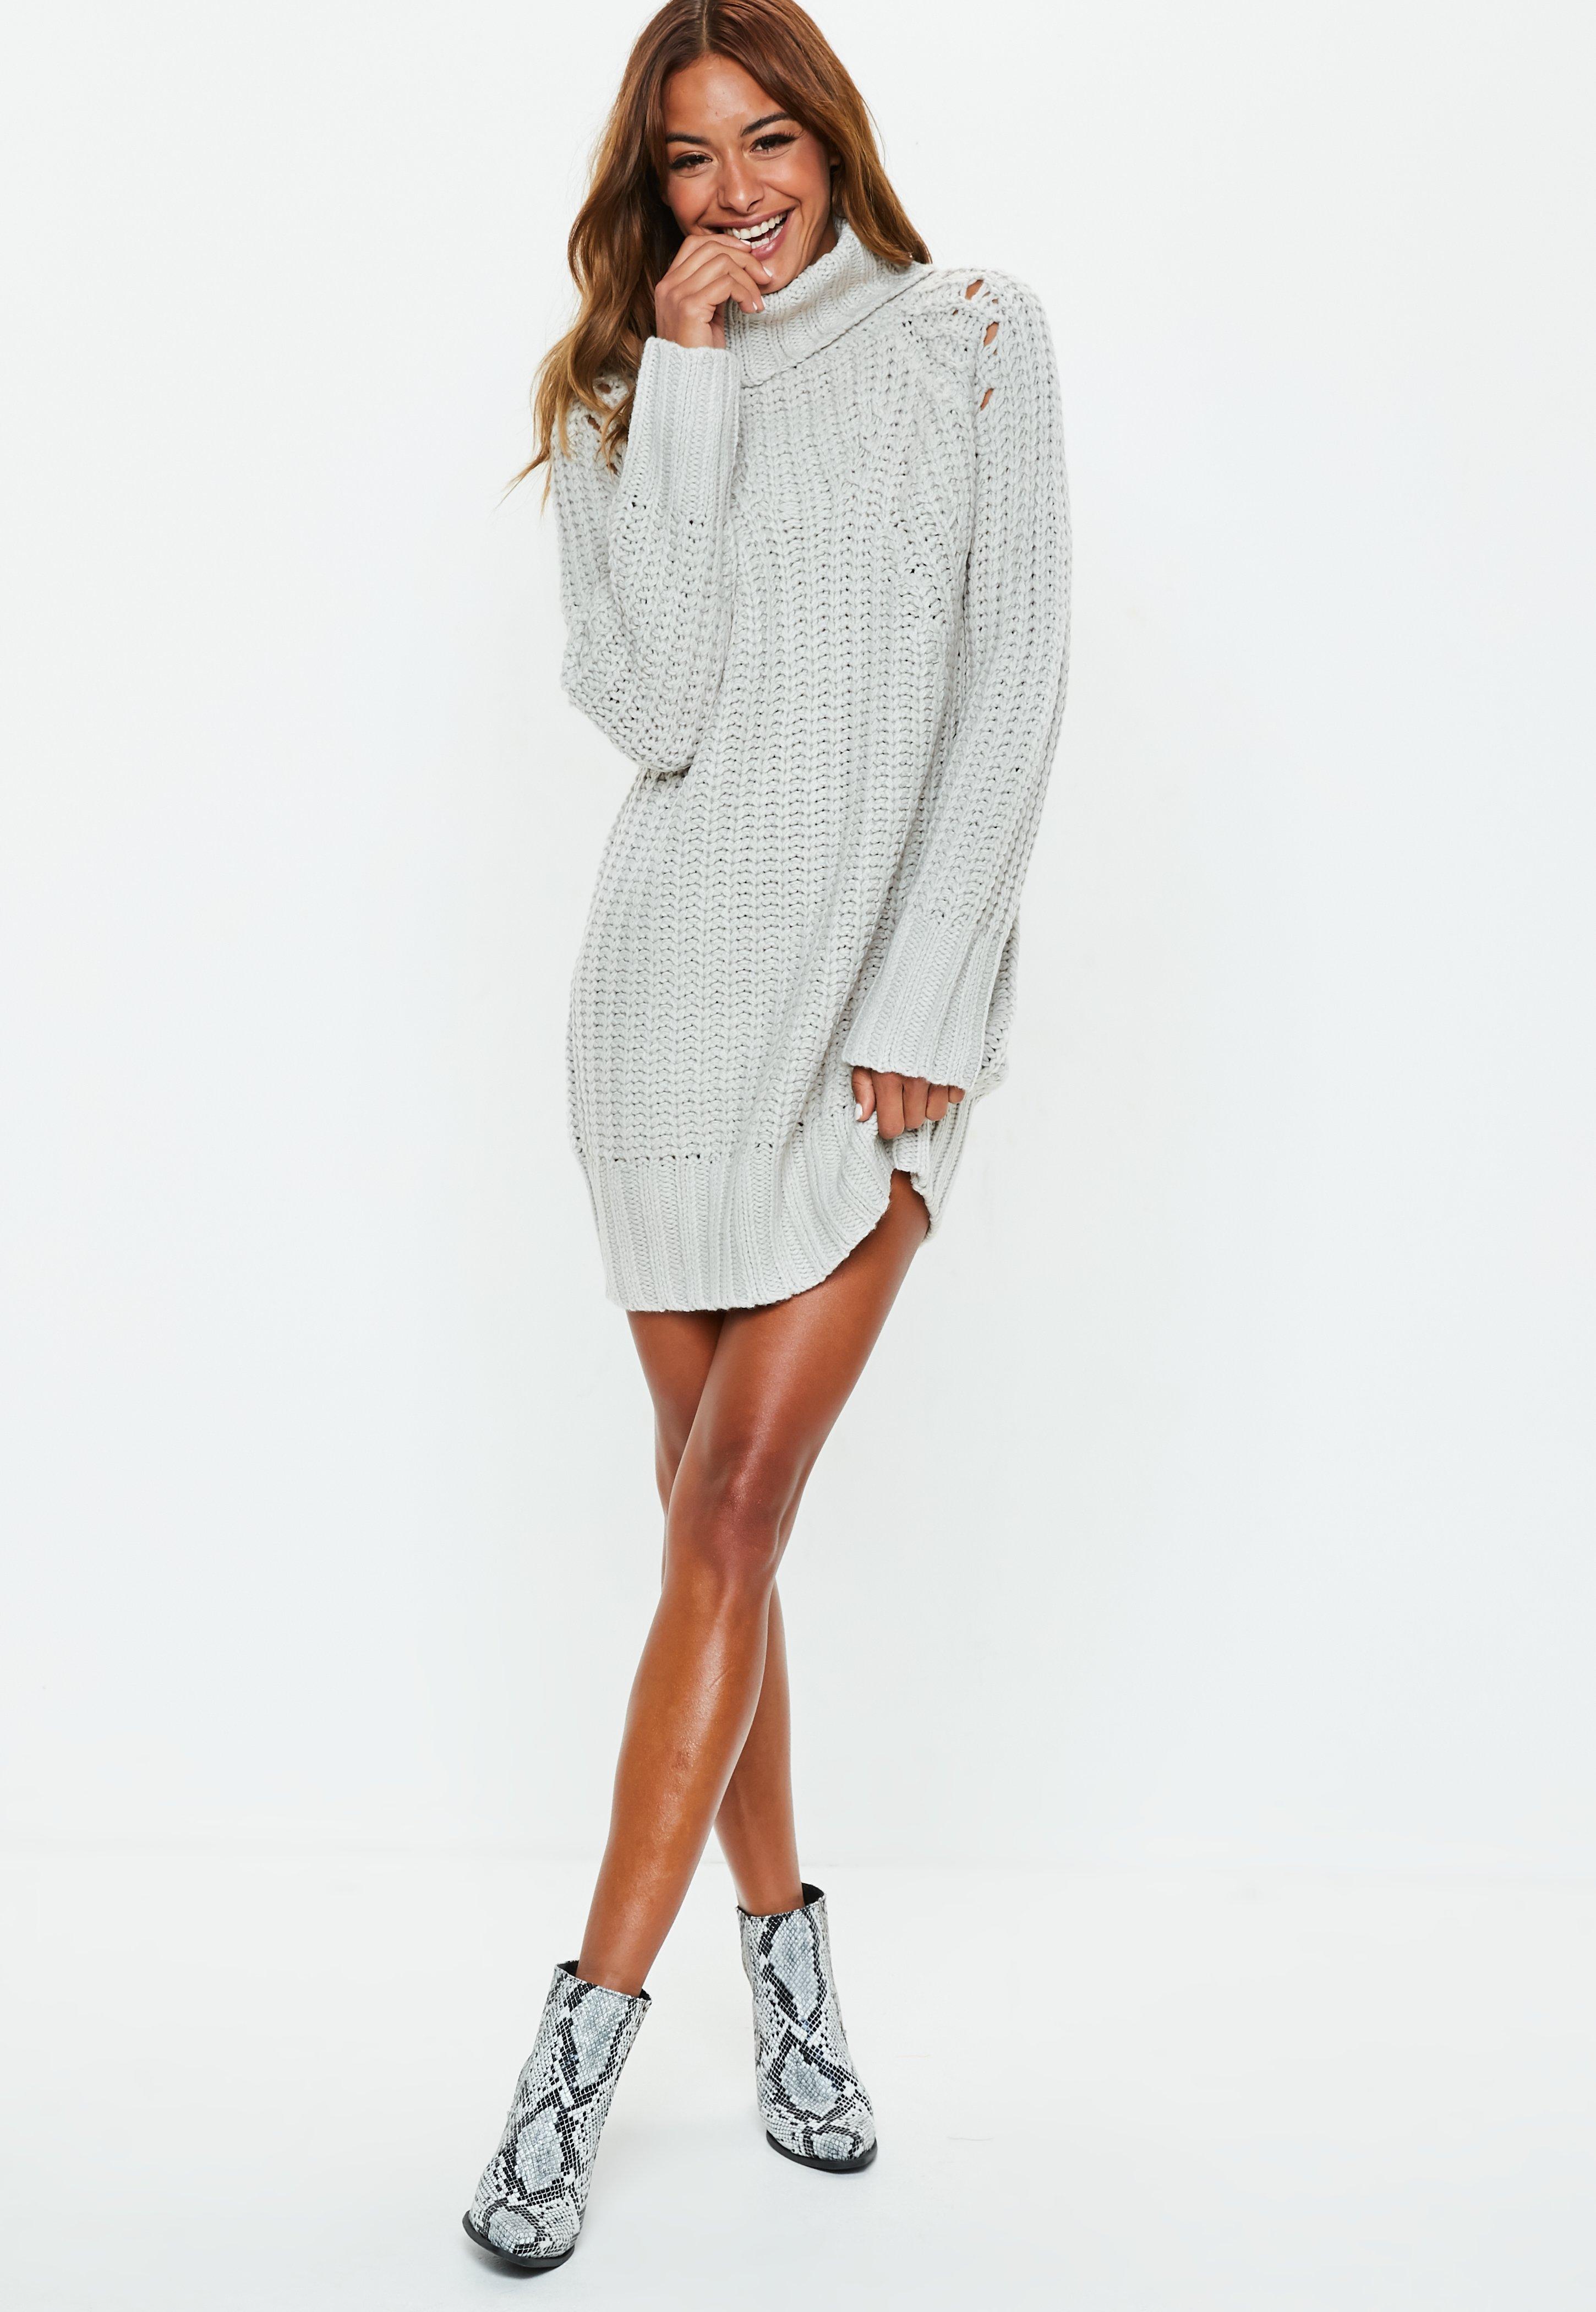 7ba92fb46f5c Jumper Dresses | Shop Knitted Dresses - Missguided